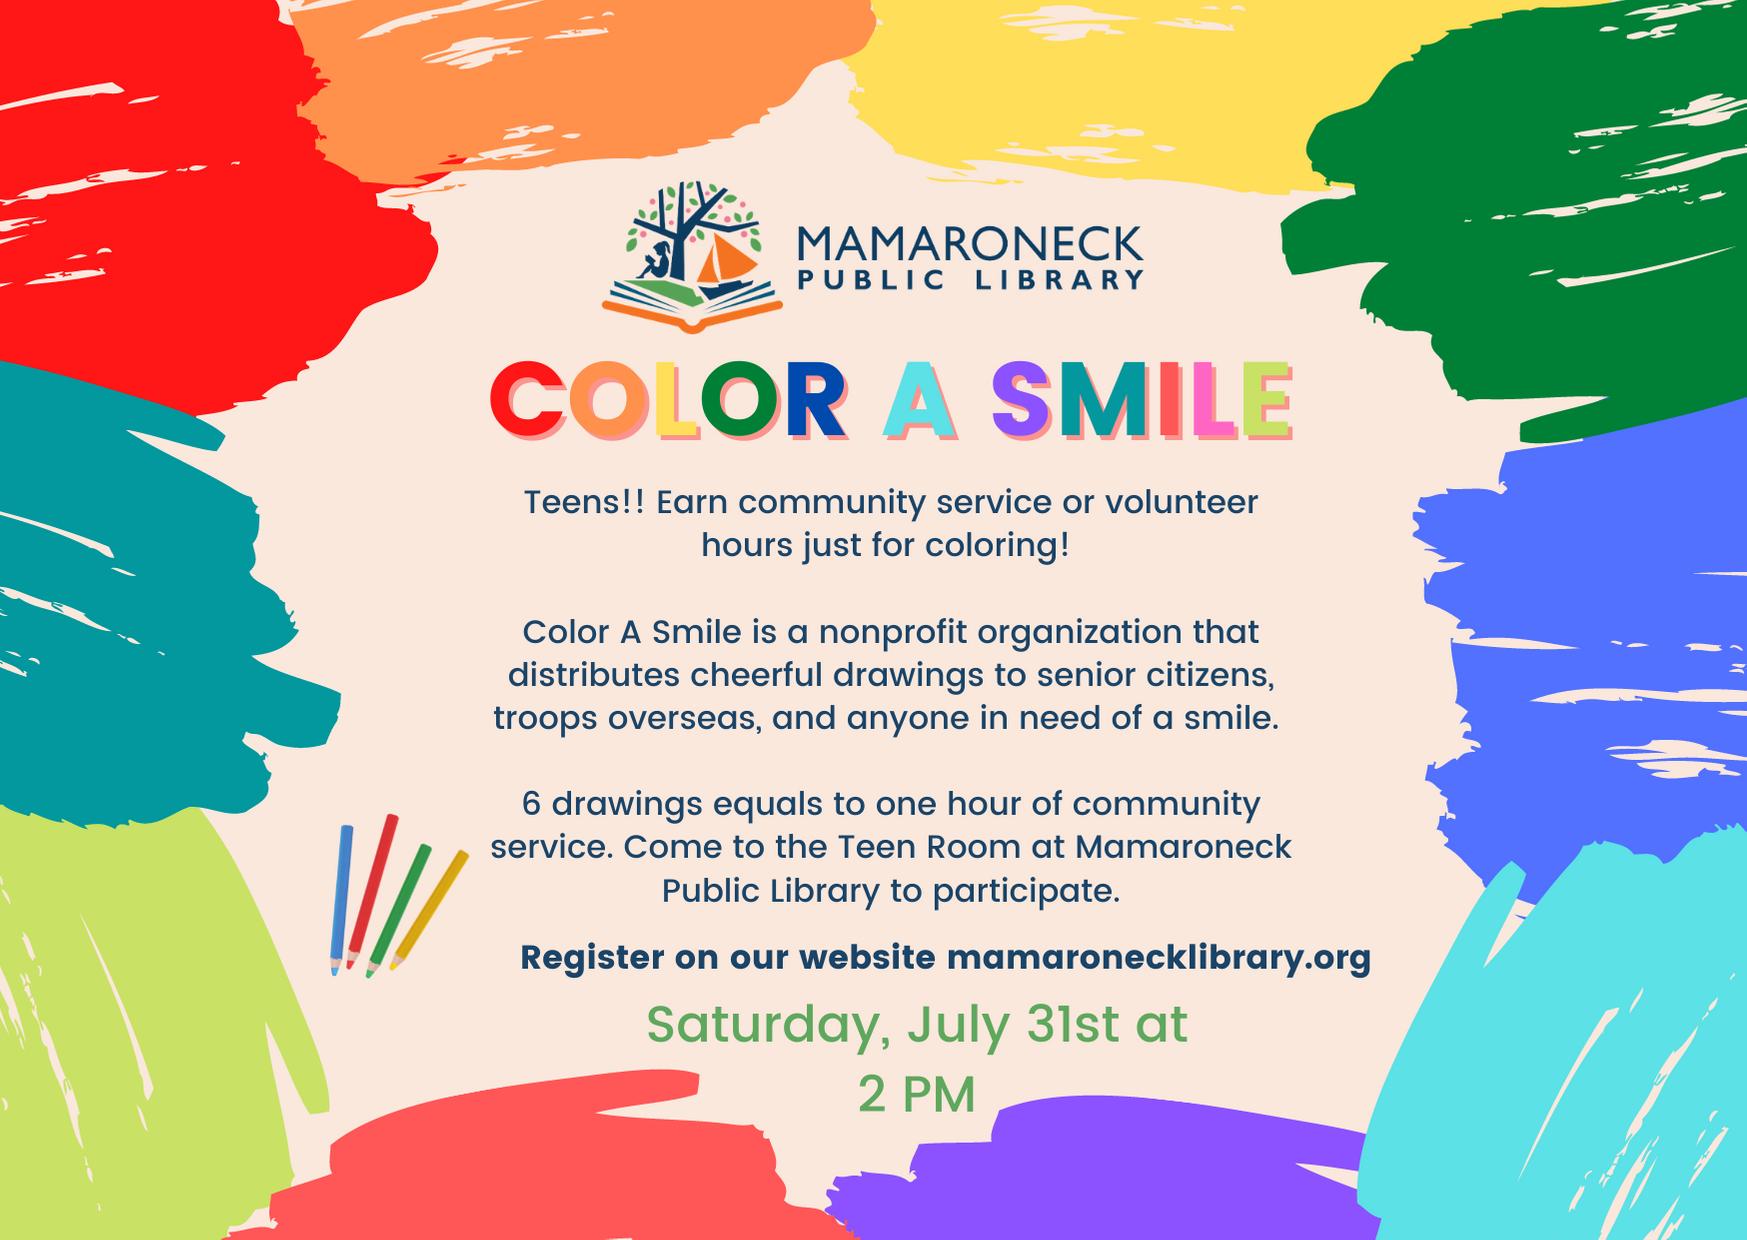 Color a Smile - Teen summer program for community service